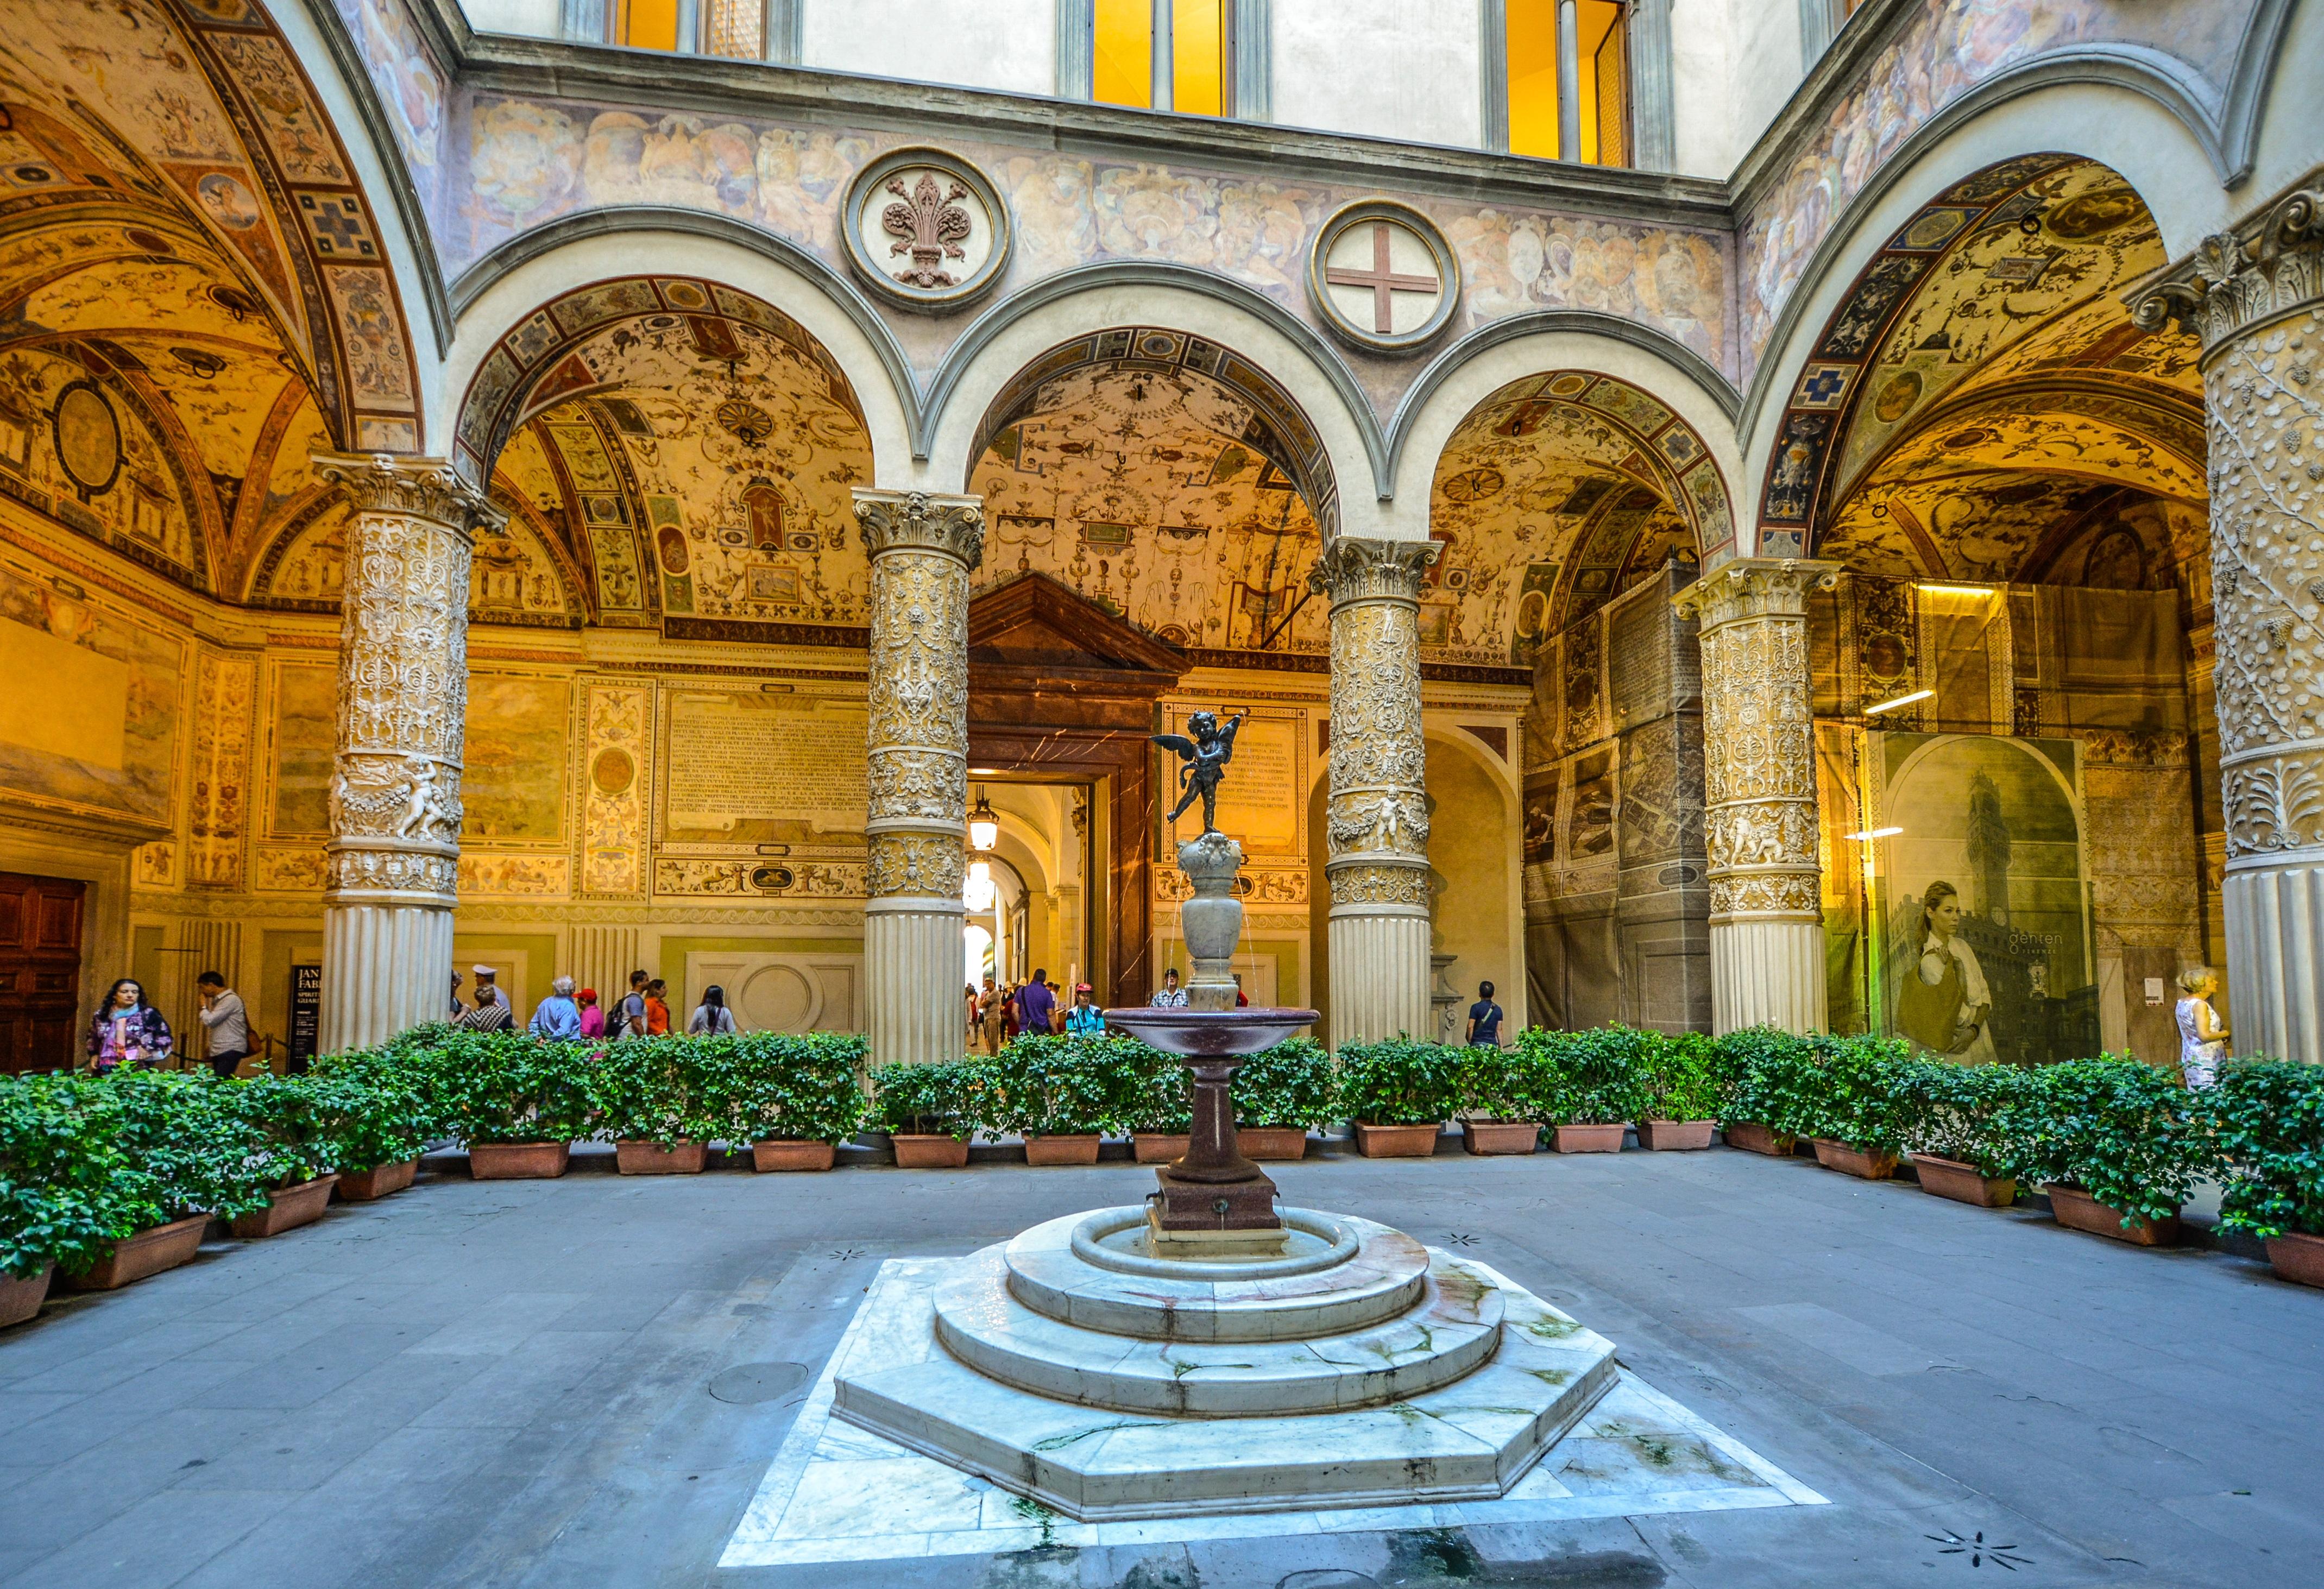 Free Images : window, building, statue, arch, column, landmark ...